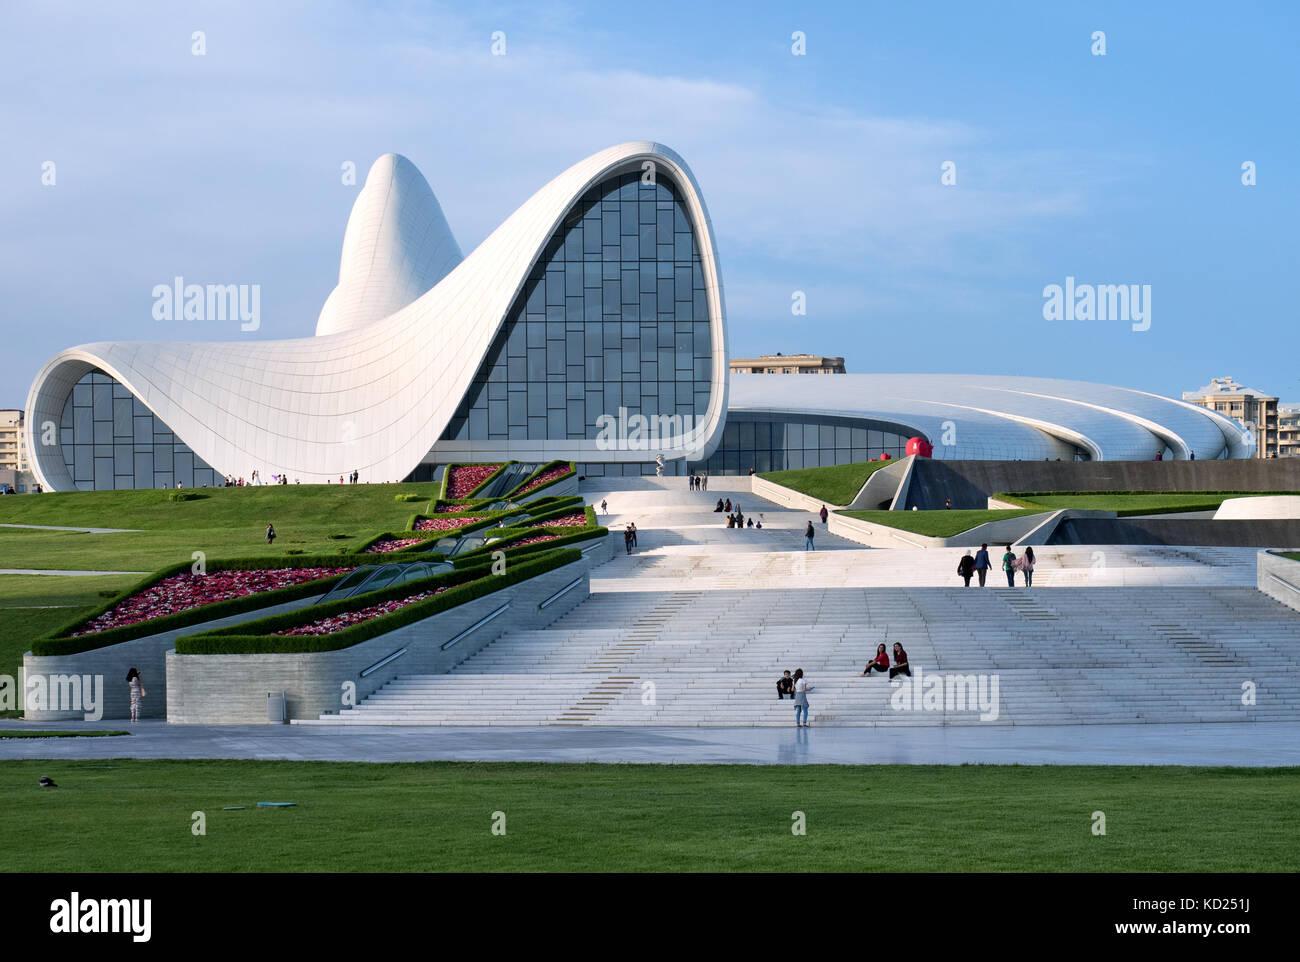 Baku, Azerbaijan : Heydar Aliyev Centre building complex designed by Iraqi-British architect Zaha Hadid. Stock Photo